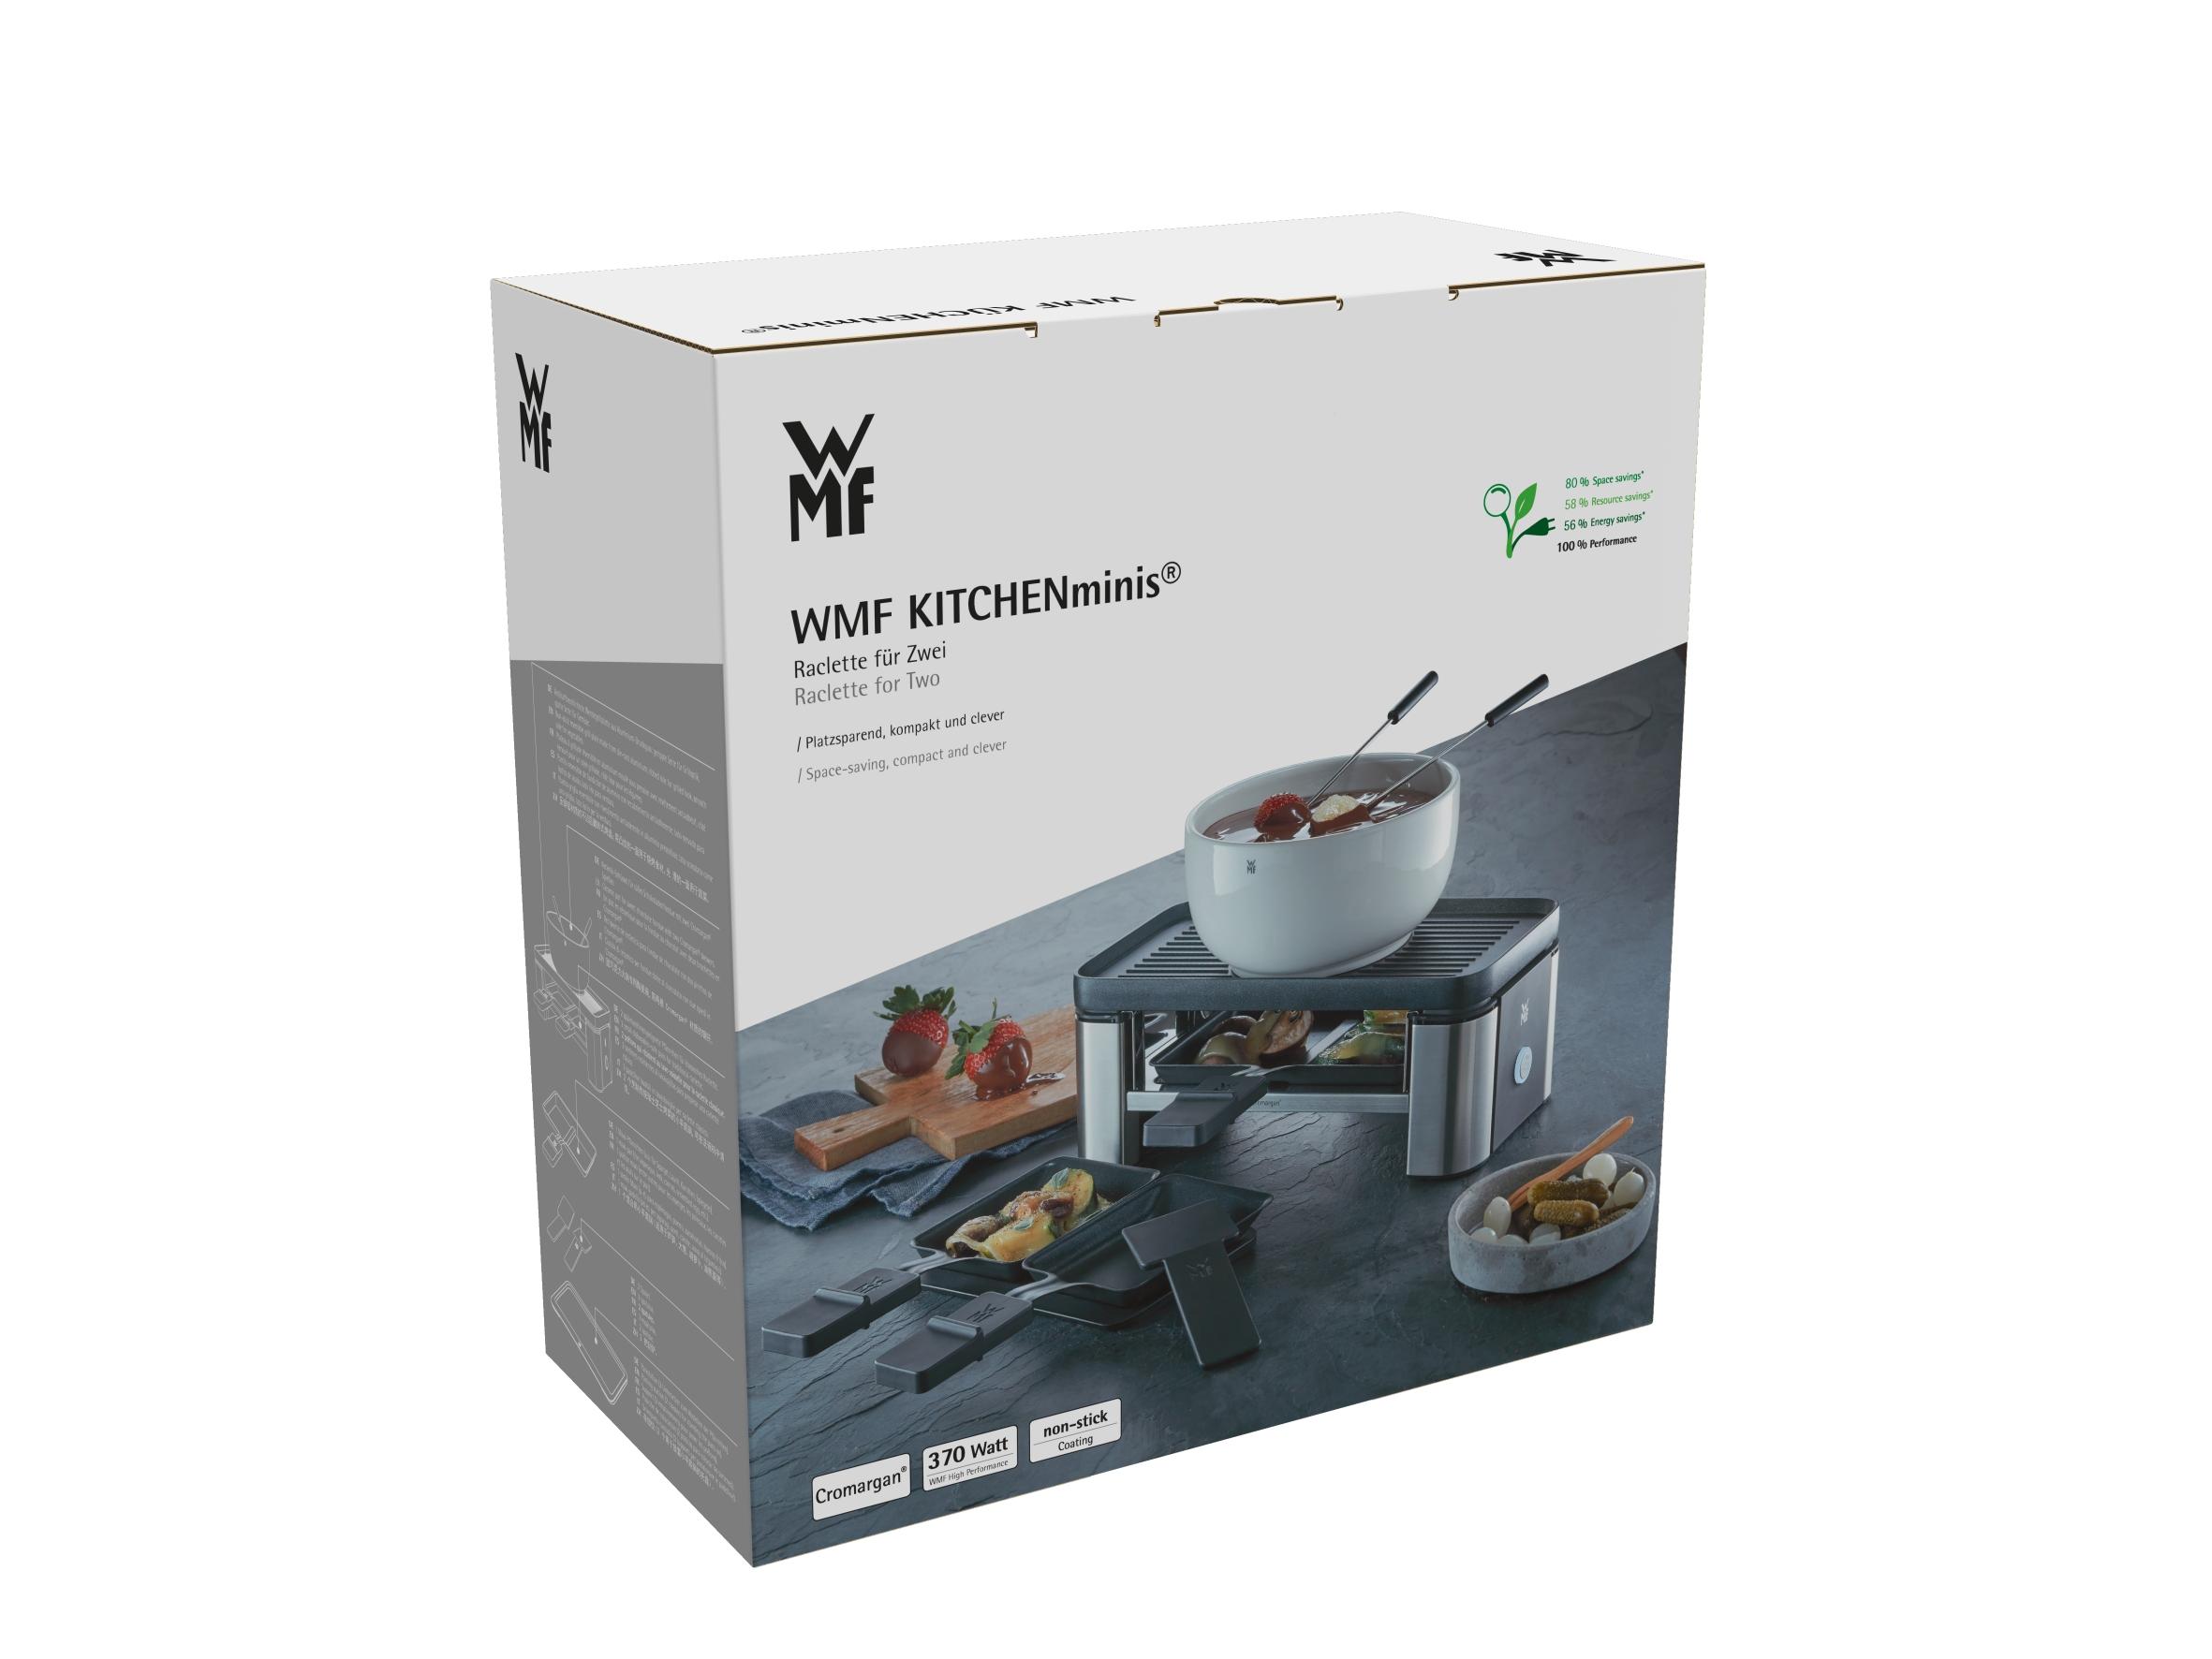 WMF KITCHENminisⓇ Raklet & Fondü Makinesi